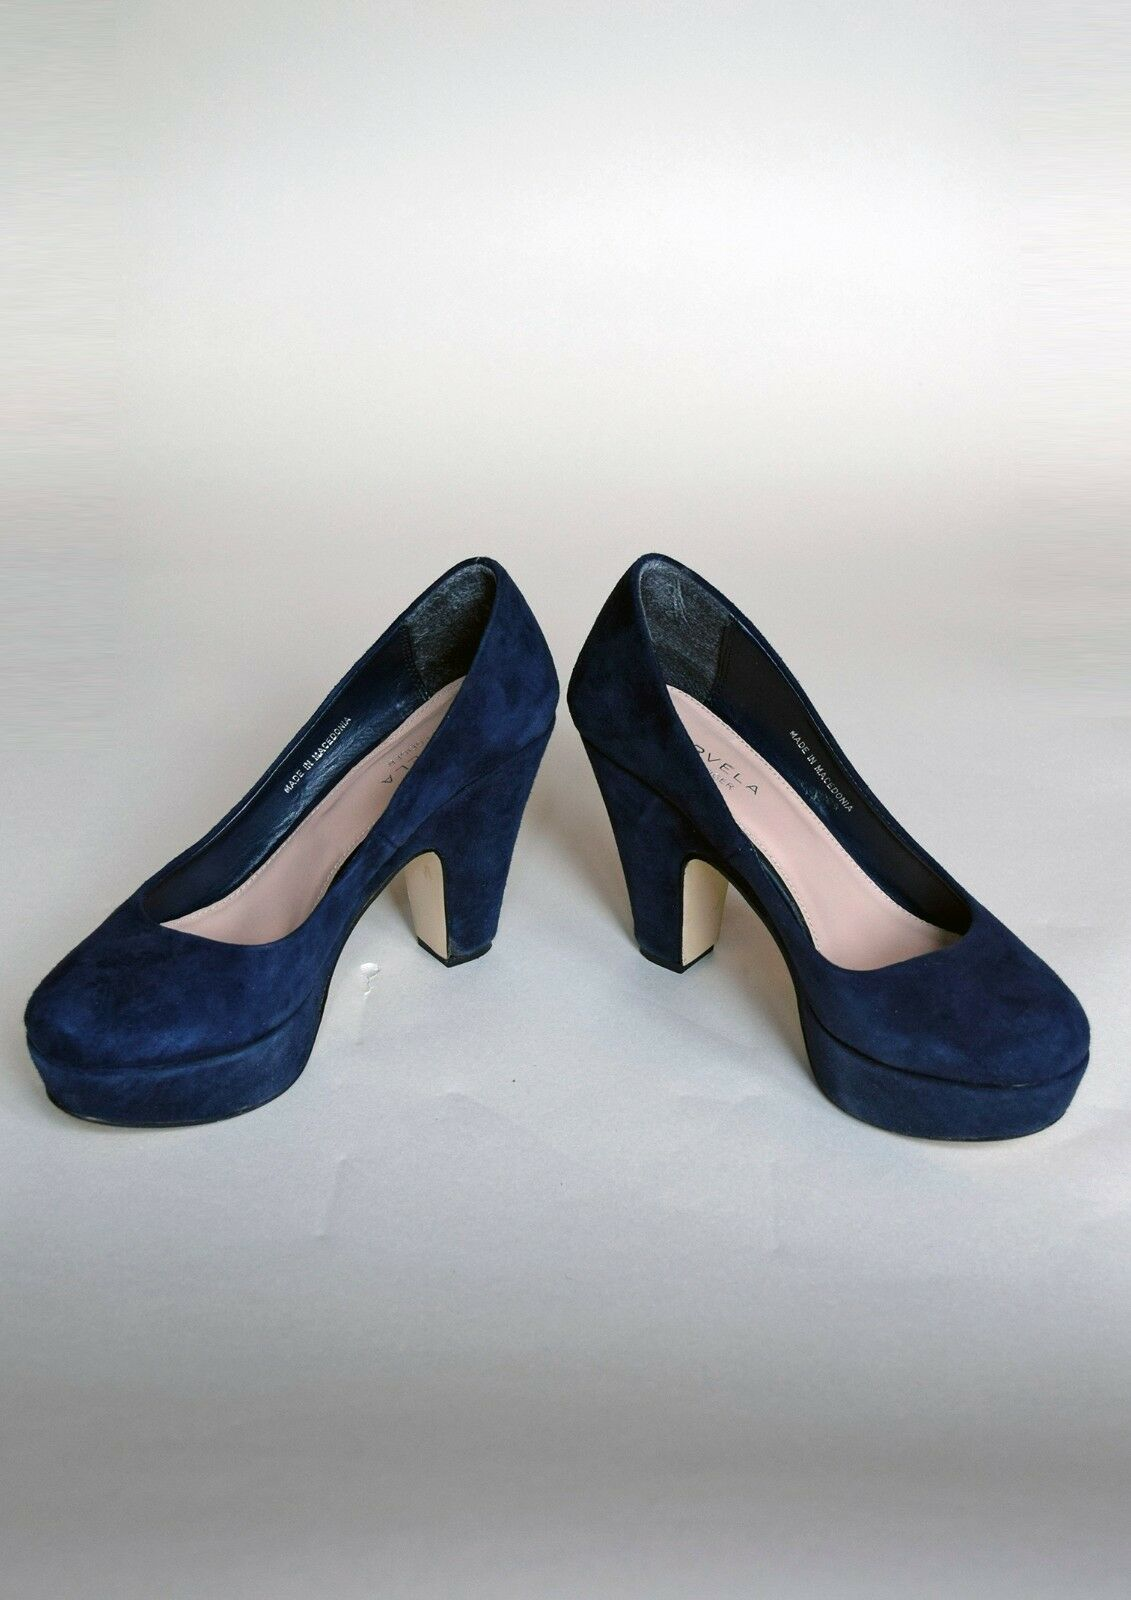 Carvela Kurt Geiger navy suede or shoes, size UK 5 or suede 38 29e013